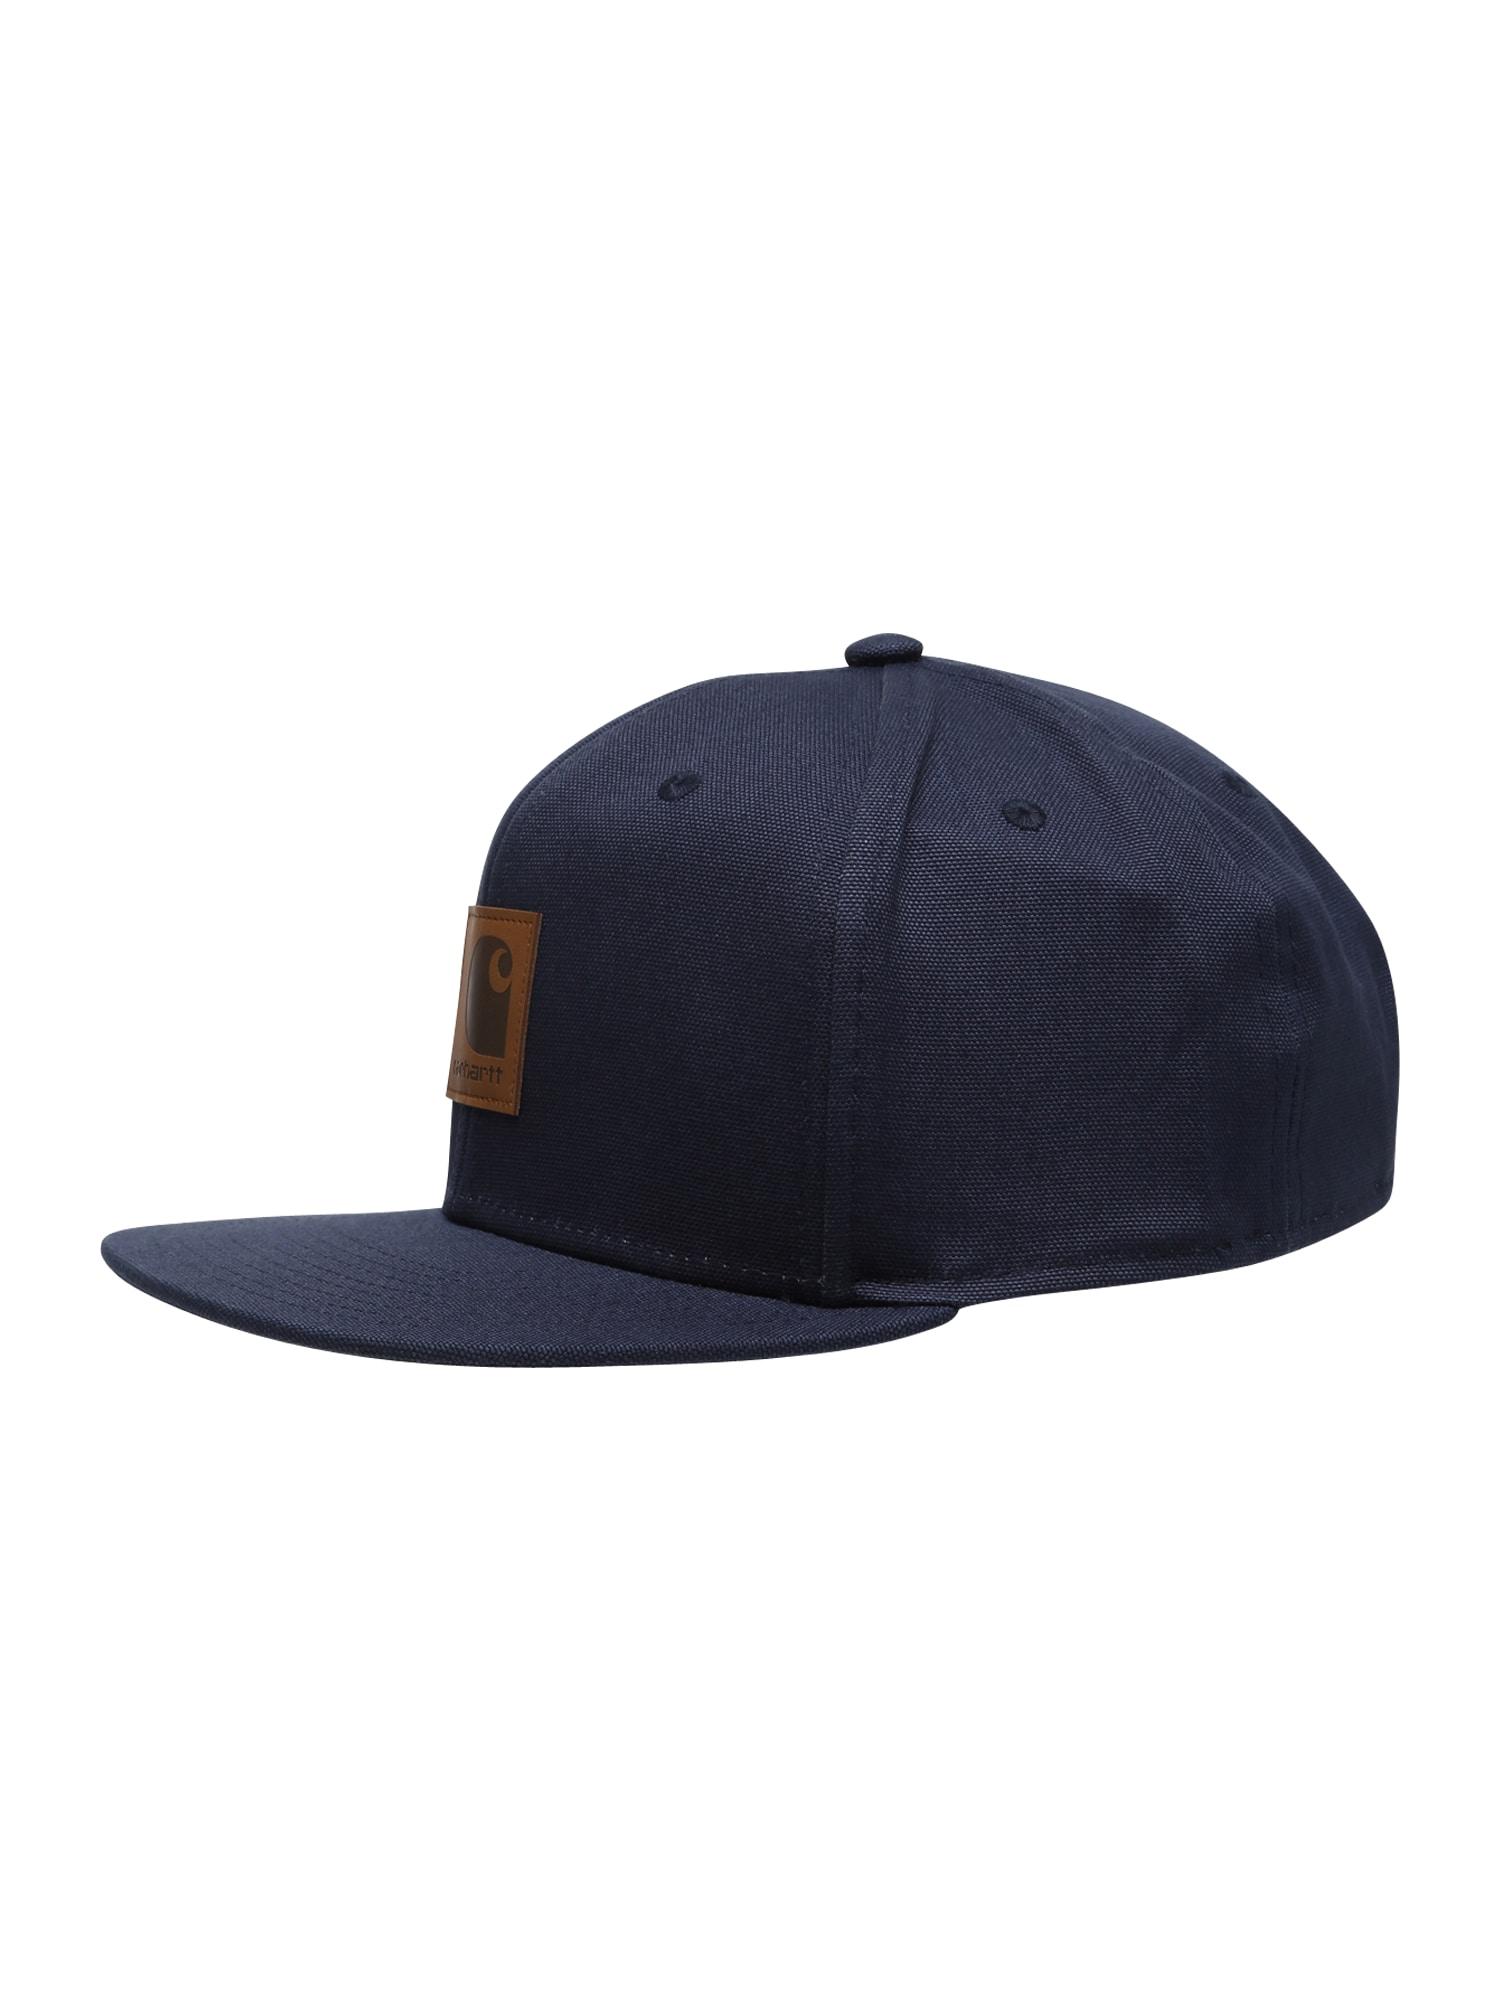 Carhartt WIP Kepurė tamsiai mėlyna